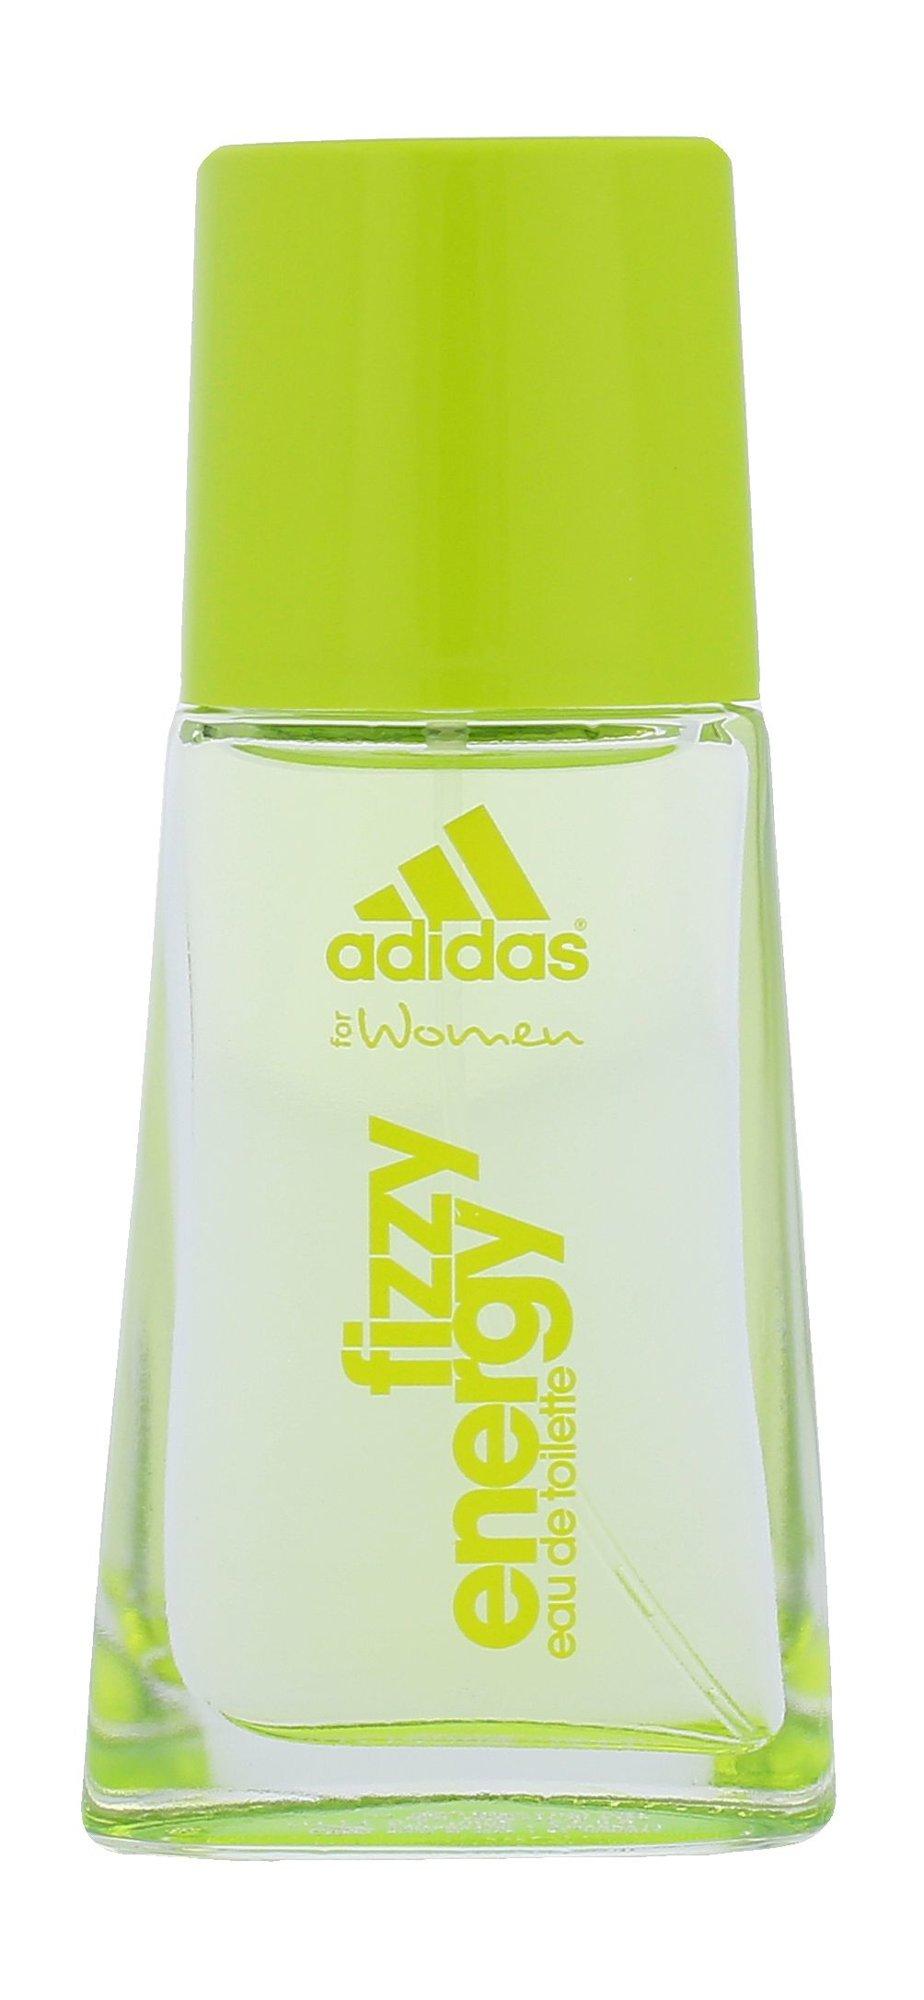 Adidas Fizzy Energy For Women EDT 30ml